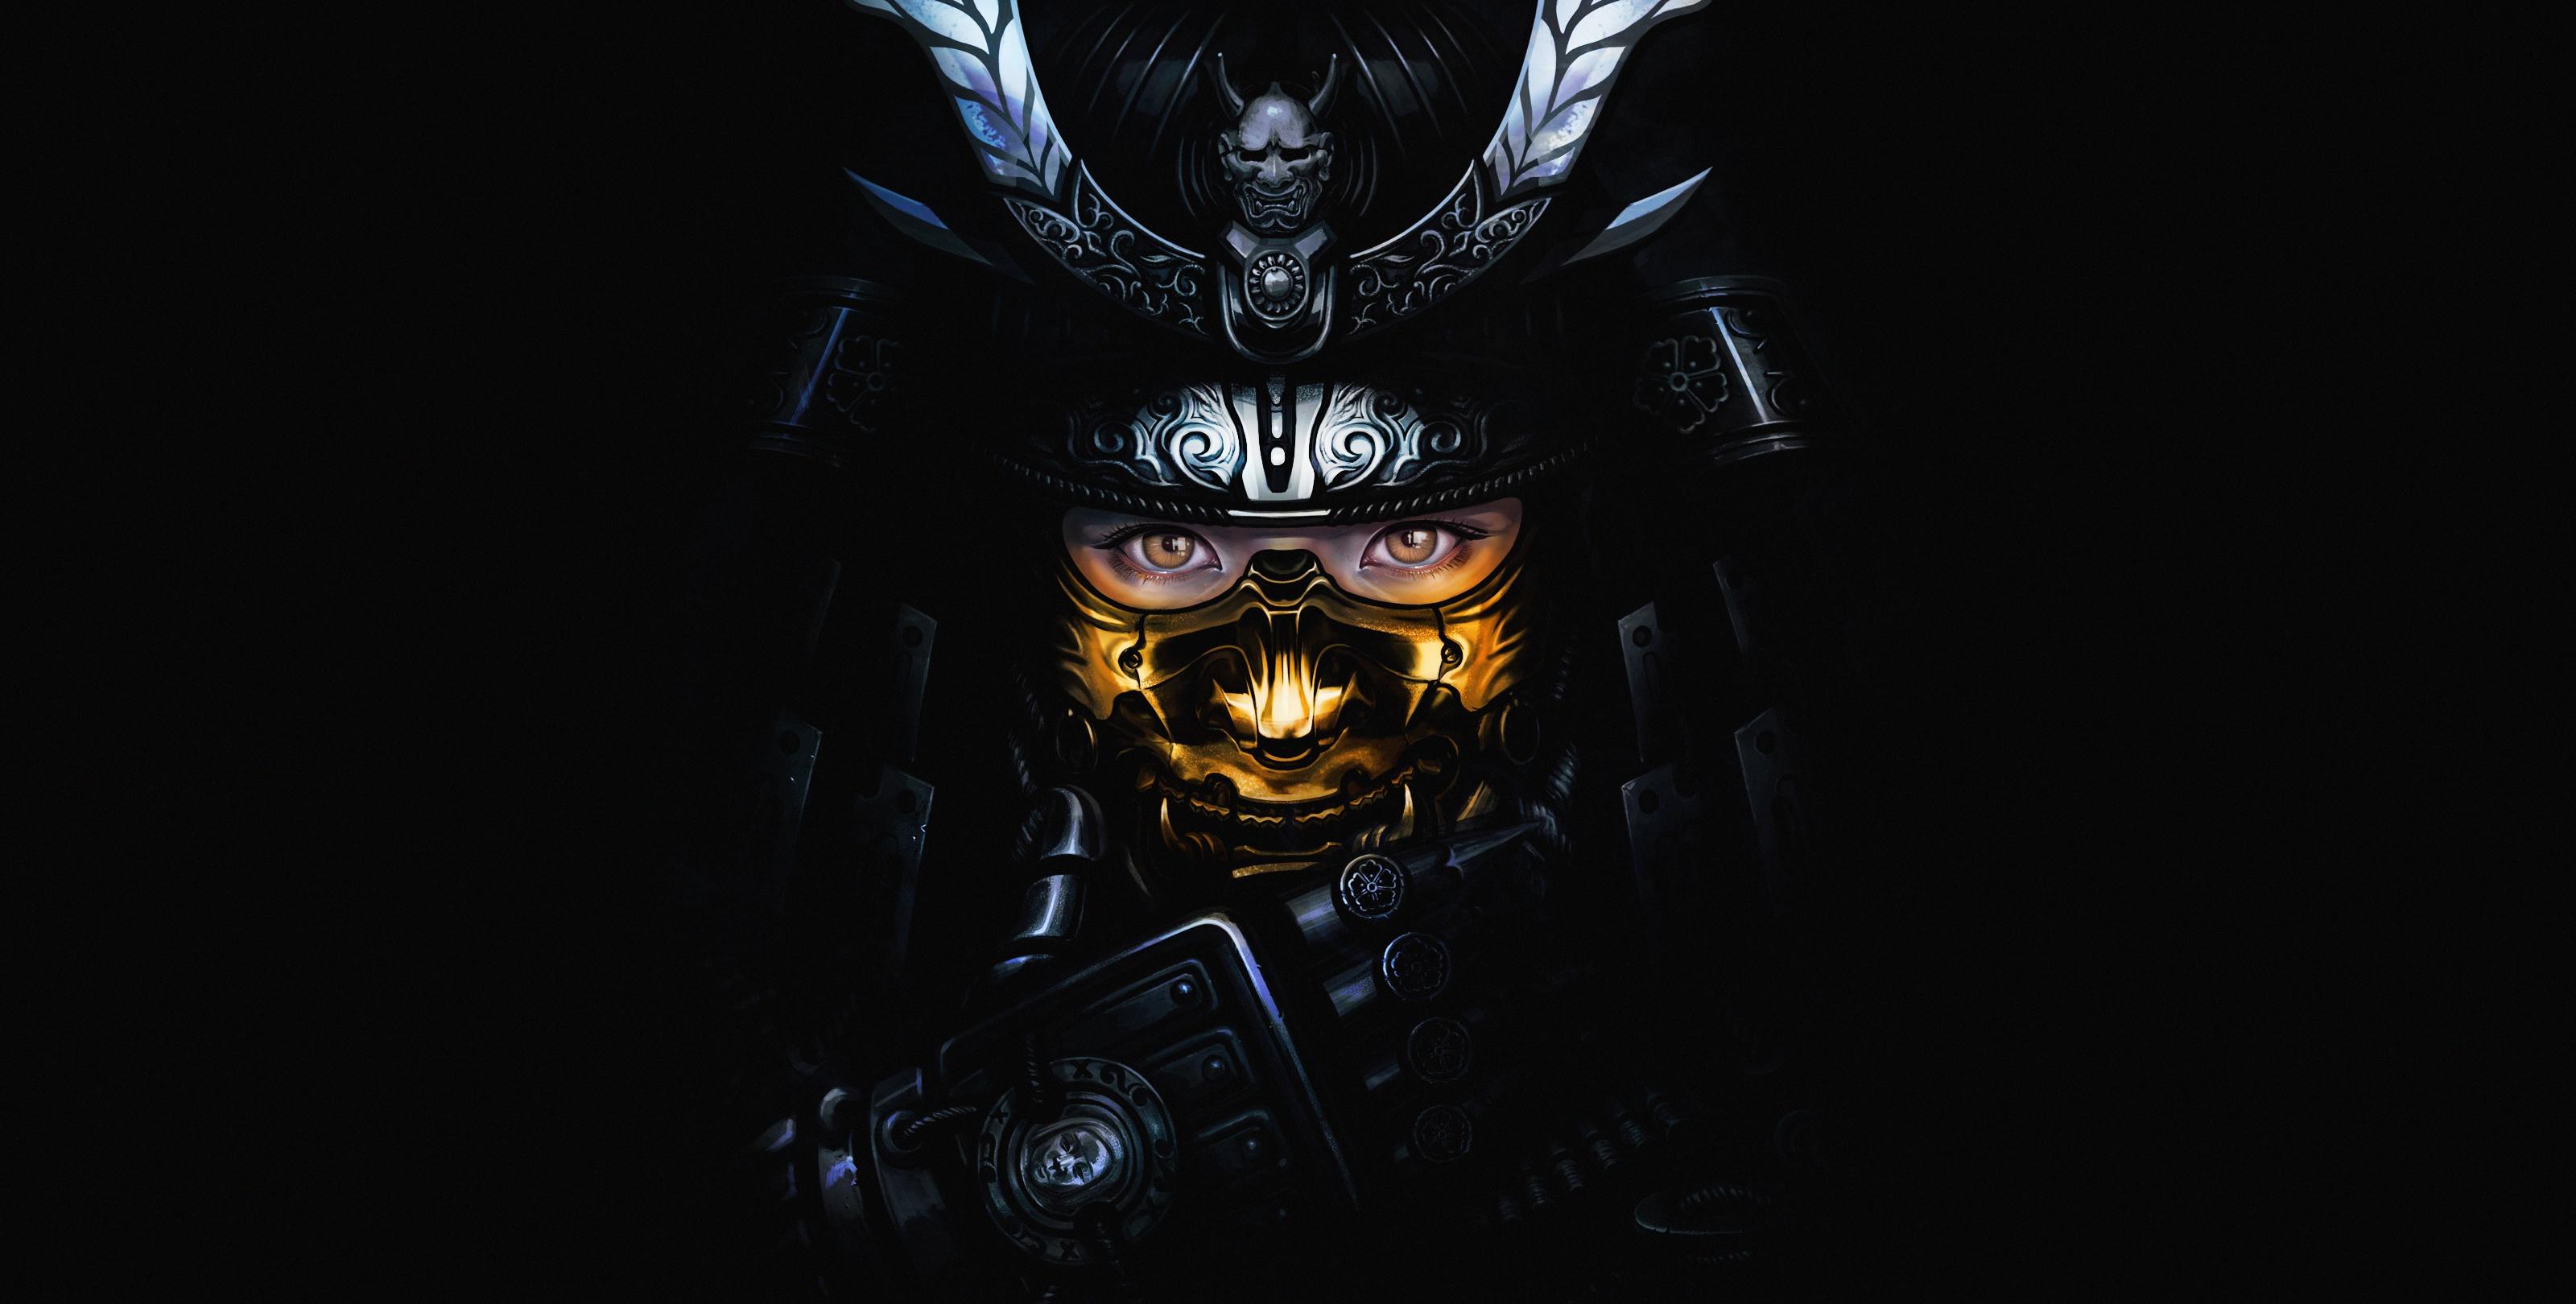 General 3200x1620 dark fantasy art face fantasy girl samurai frontal view oni mask